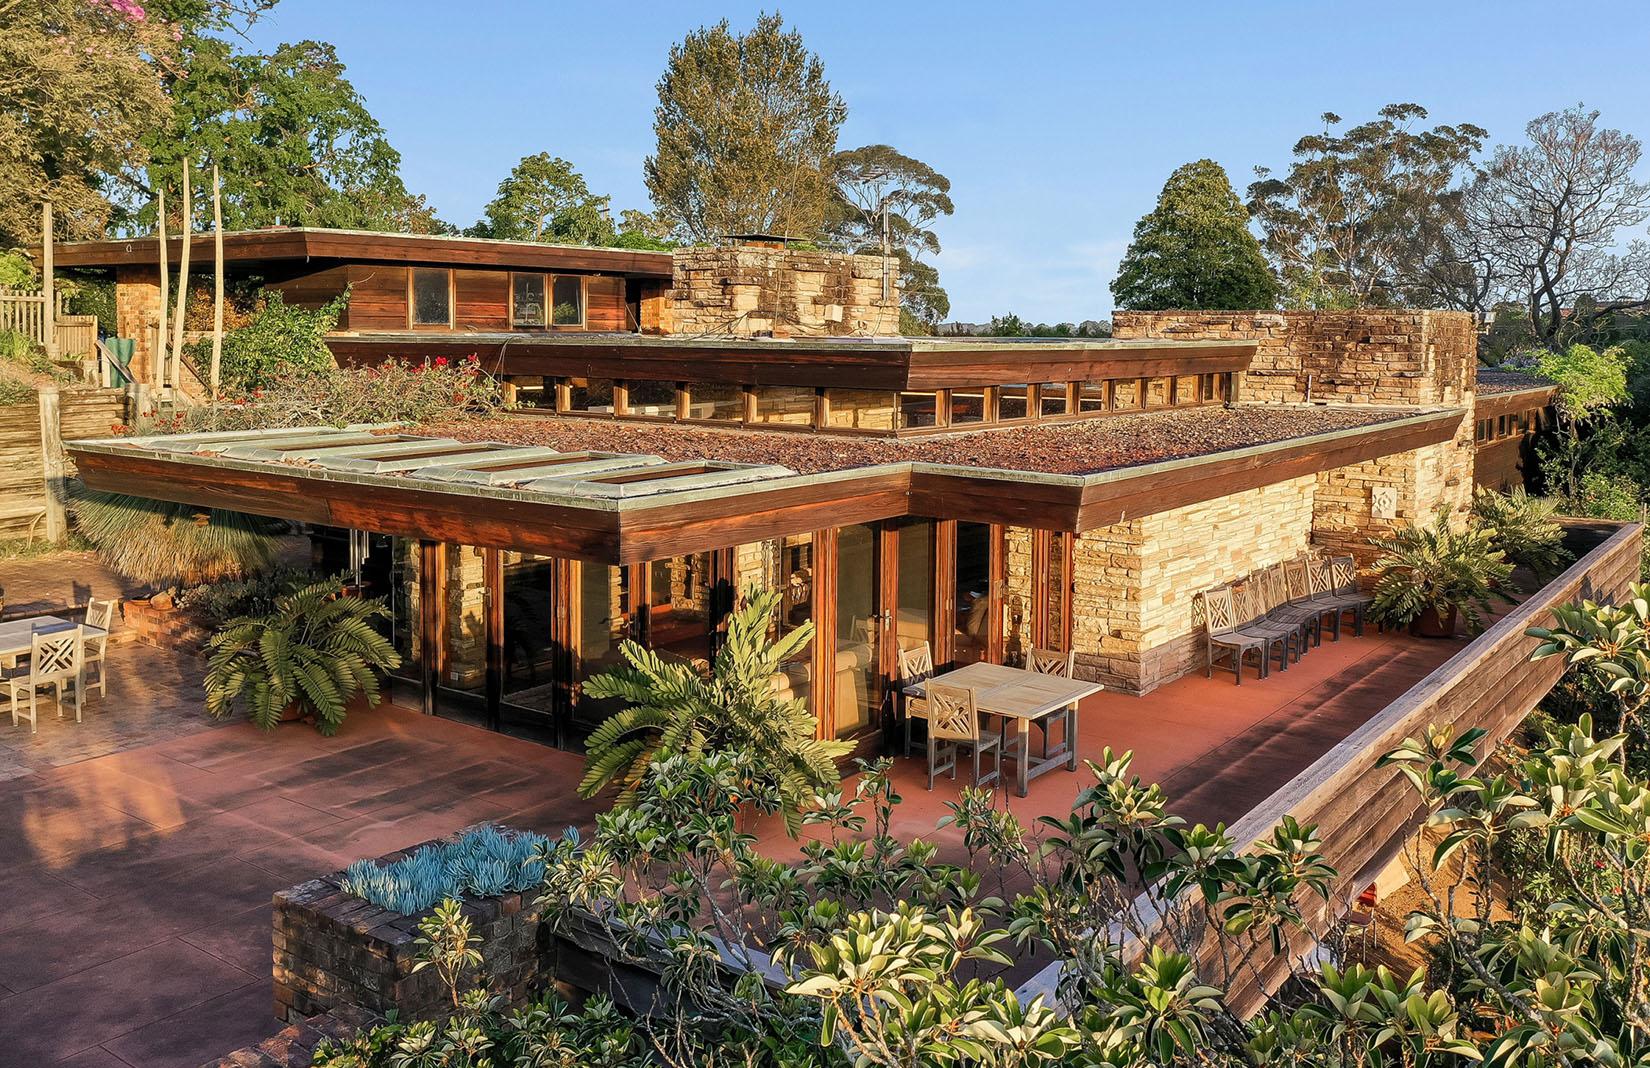 Sydney Sotheby's International Realty